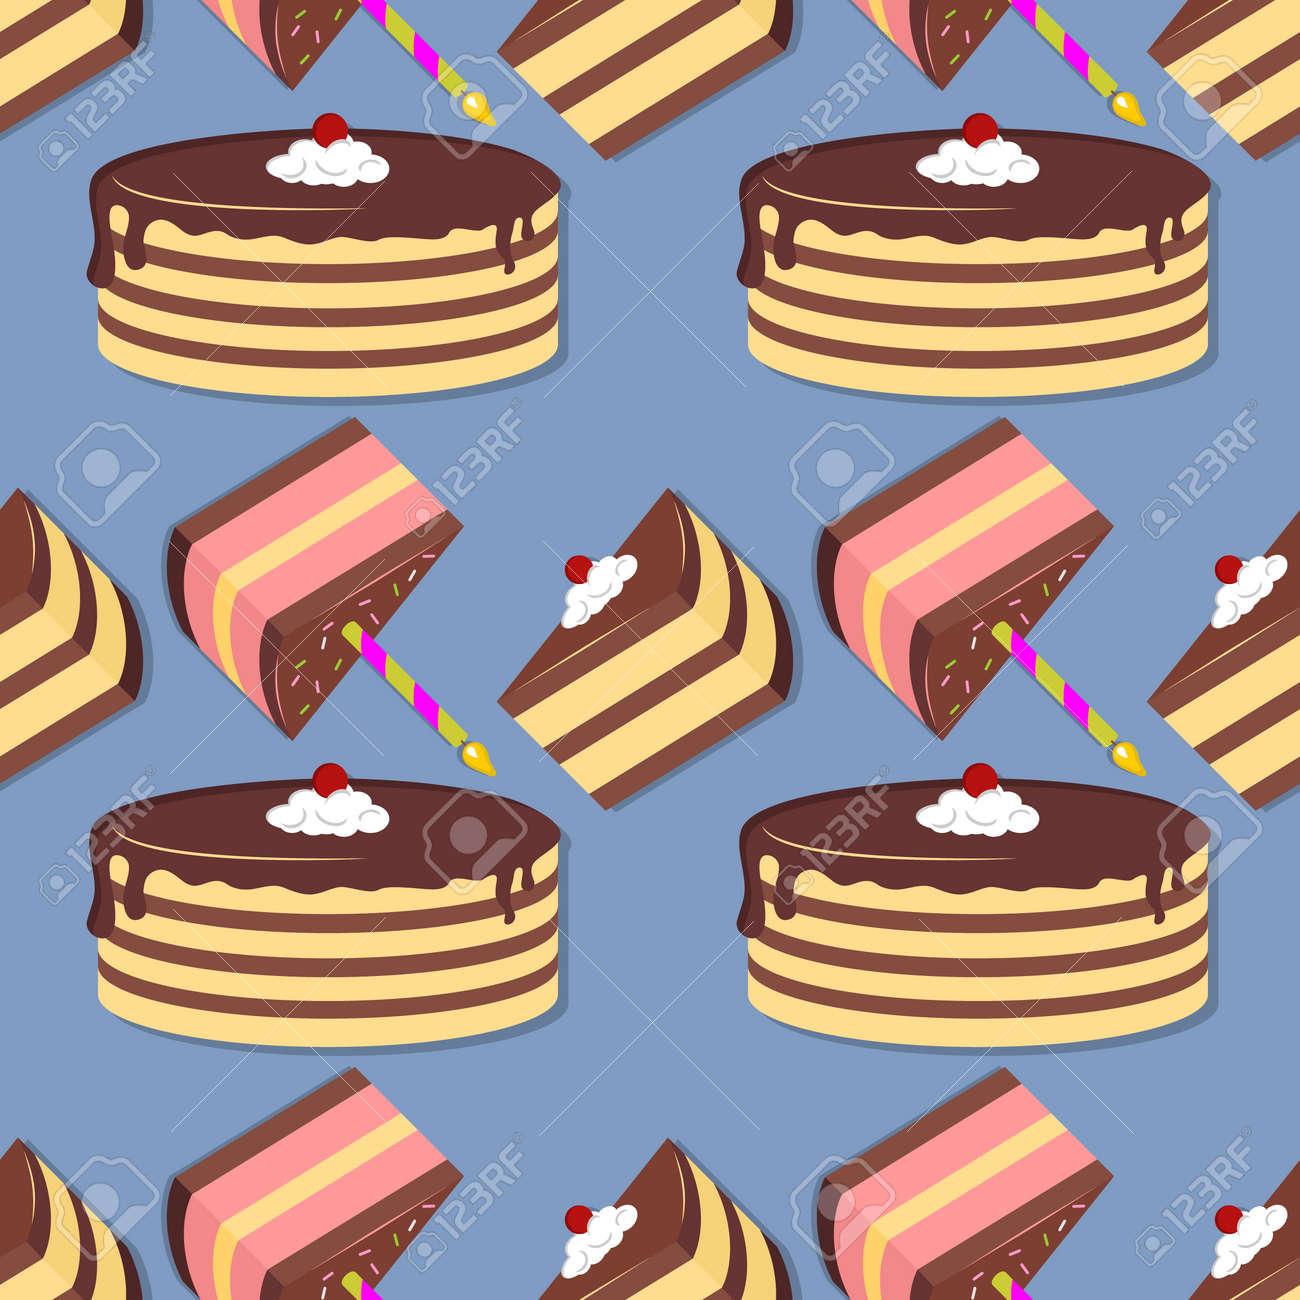 Cake seamless pattern. Flat style vector illustration - 171099094